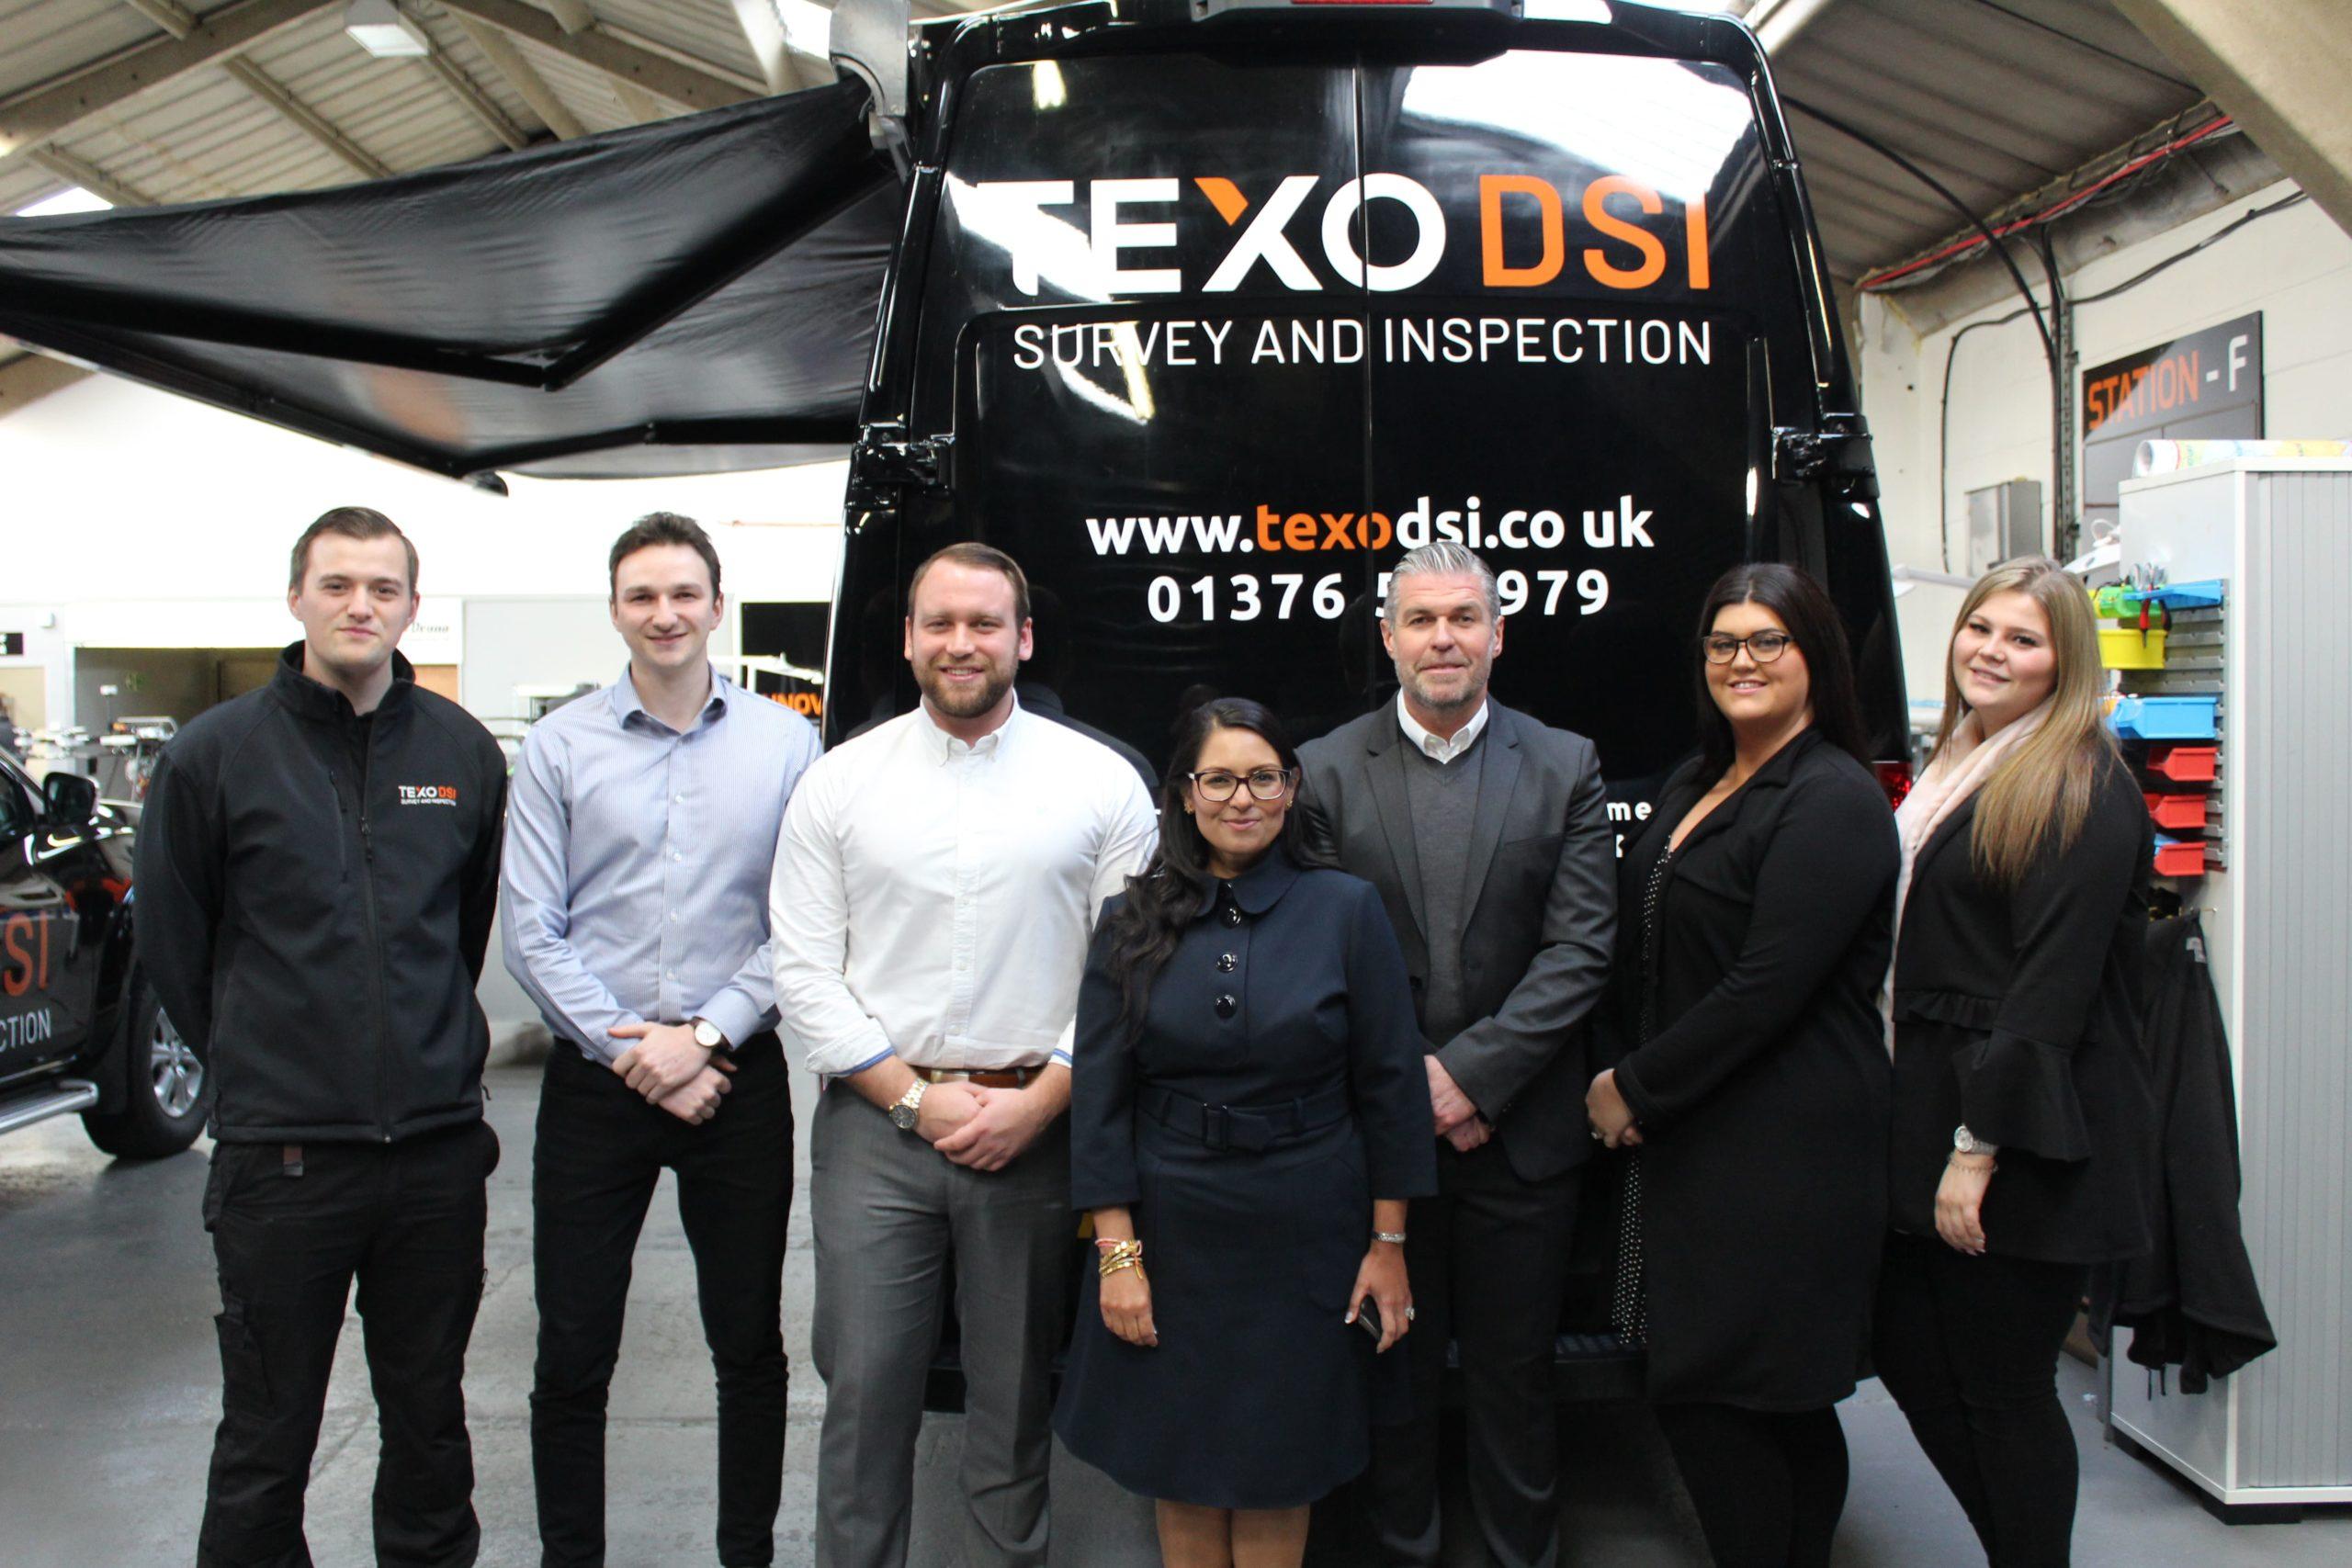 Home Secretary Priti Patel visits Texo DSI